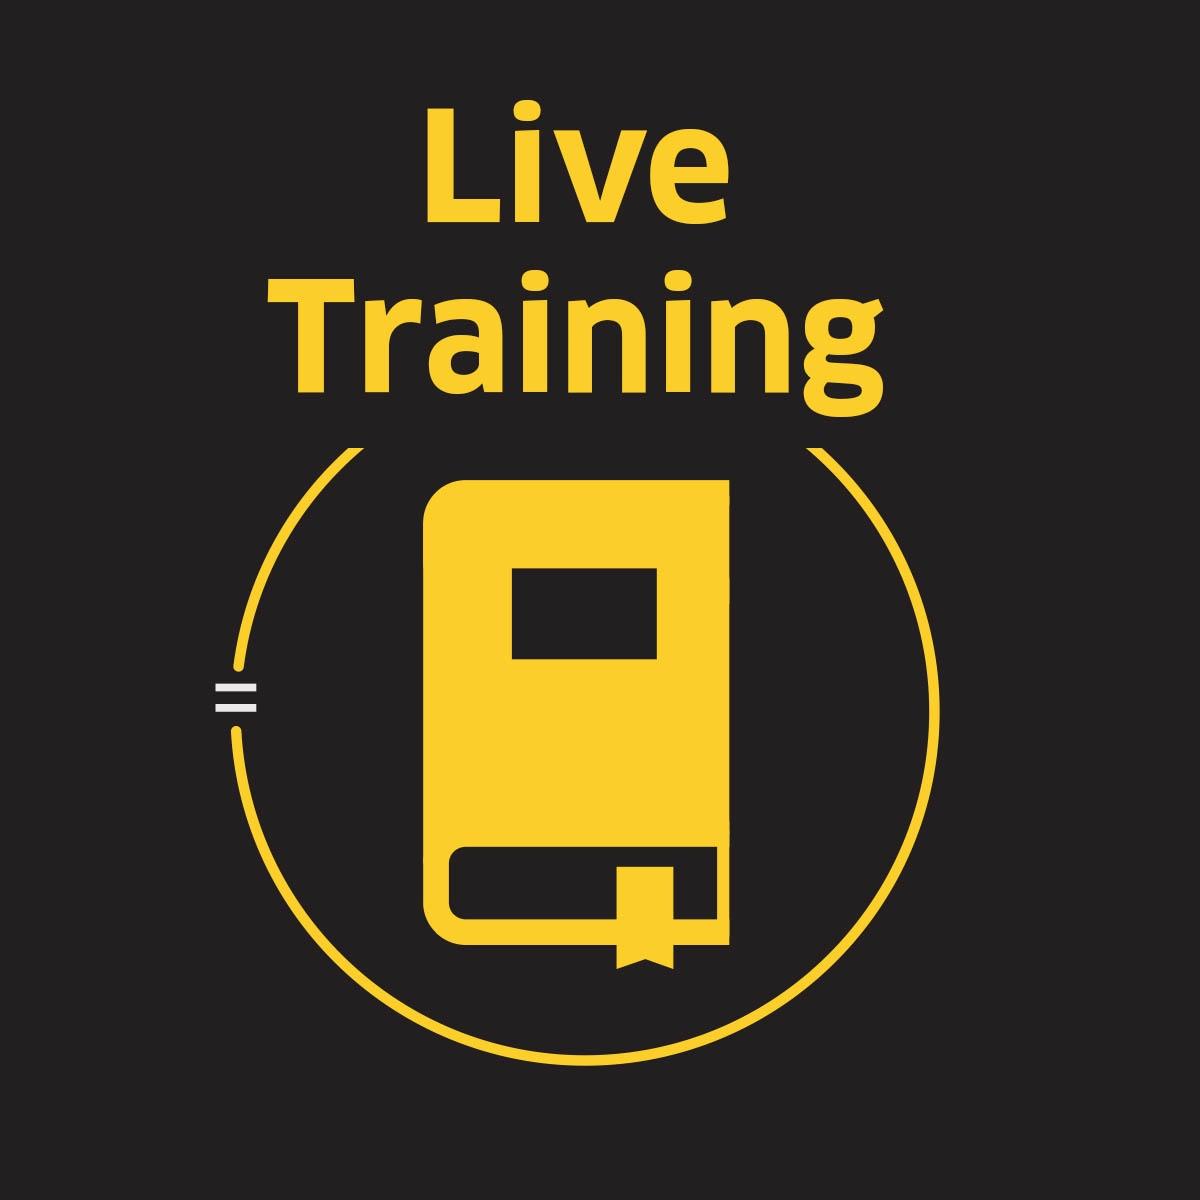 Live Training.jpg